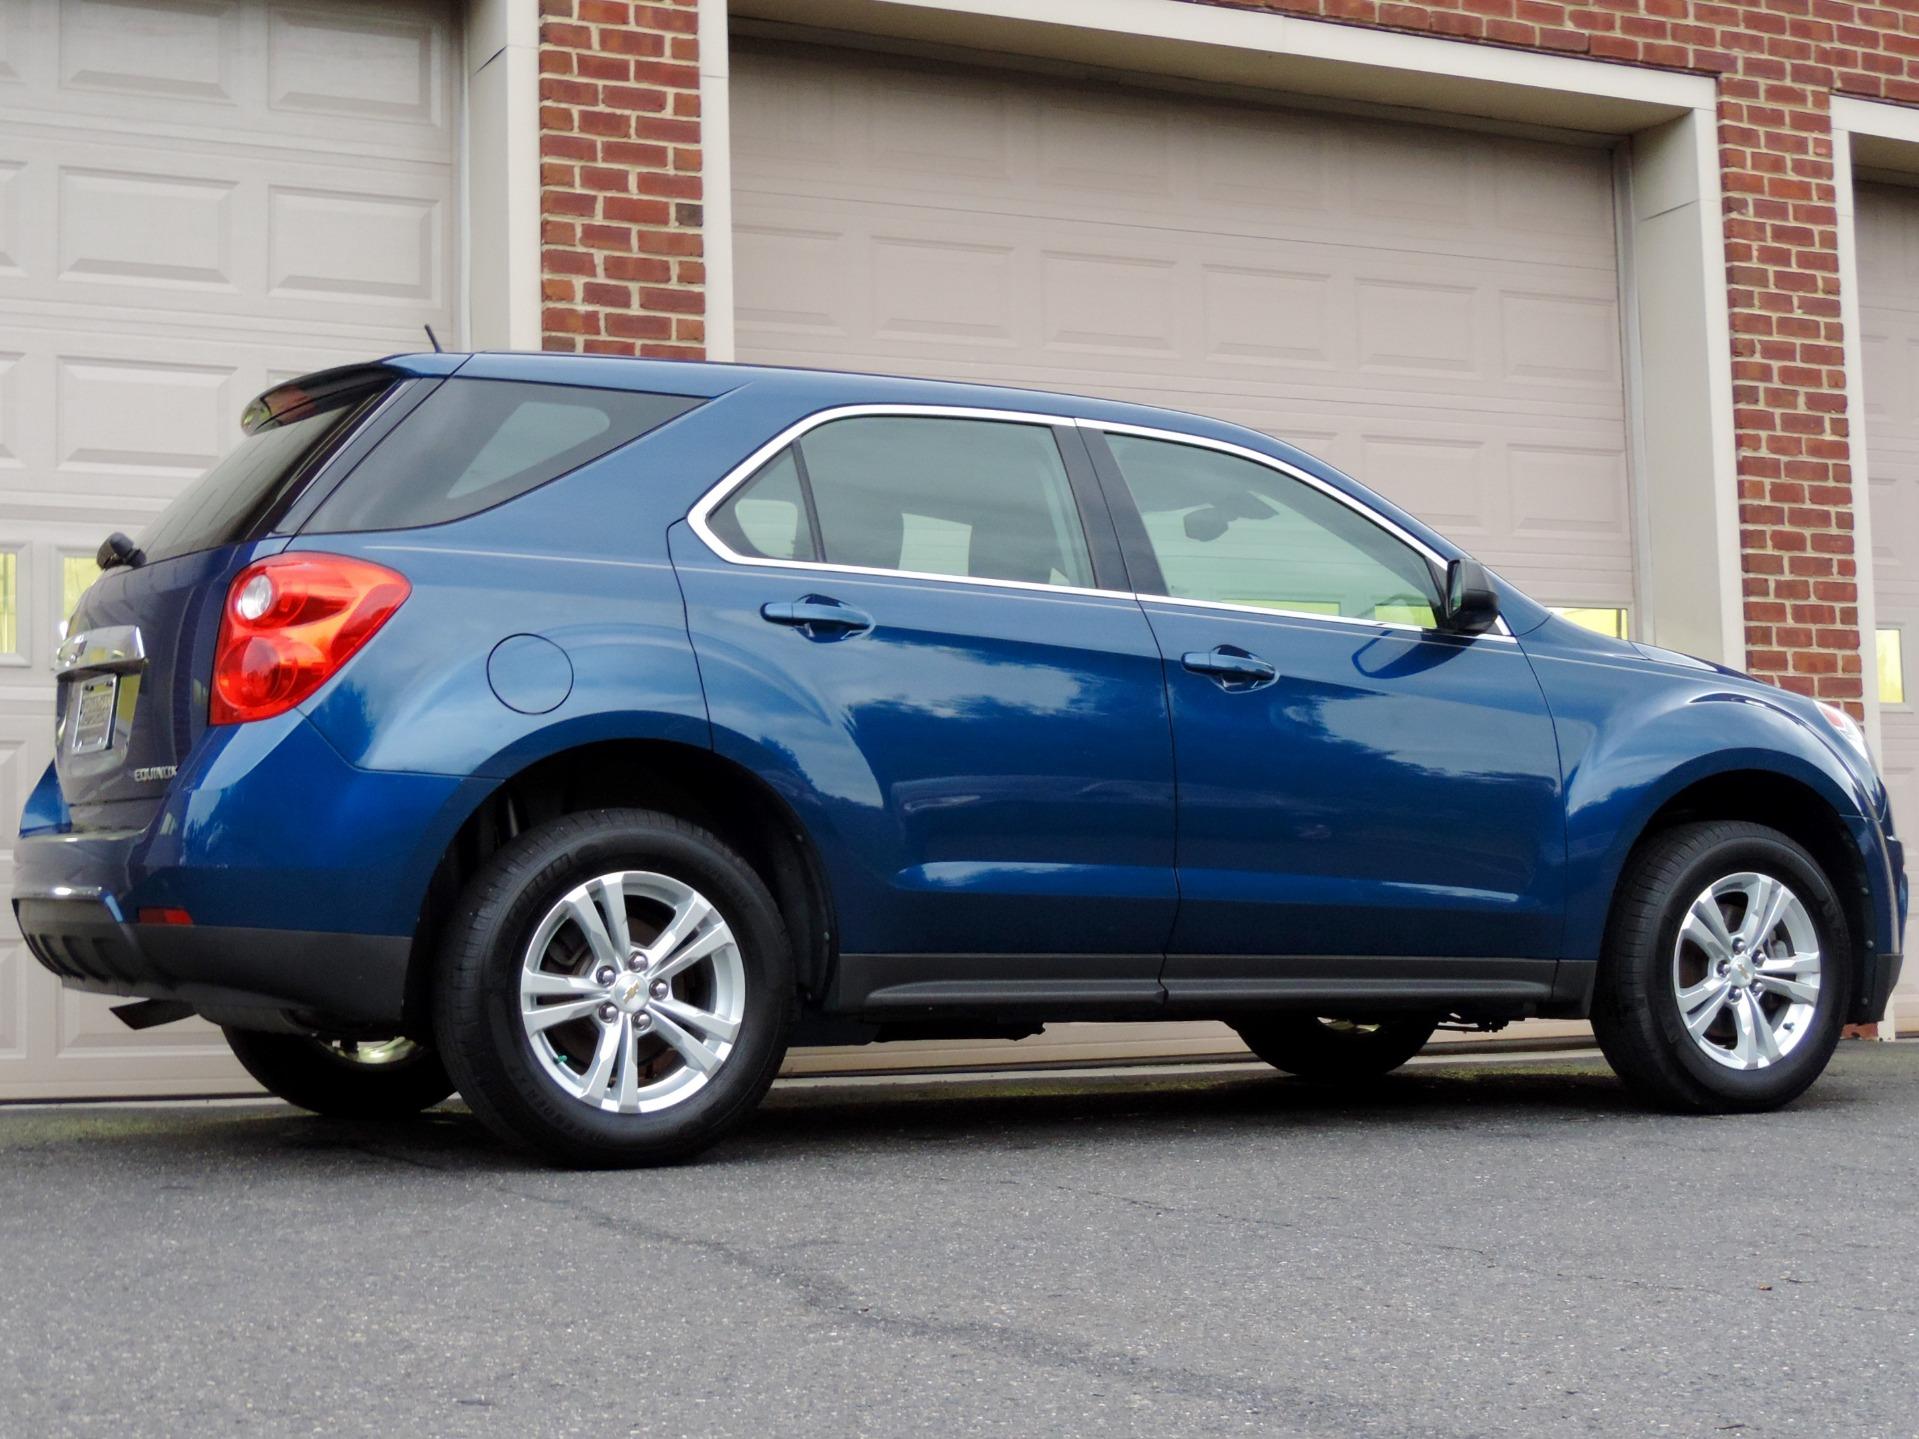 Used-2010-Chevrolet-Equinox-LS